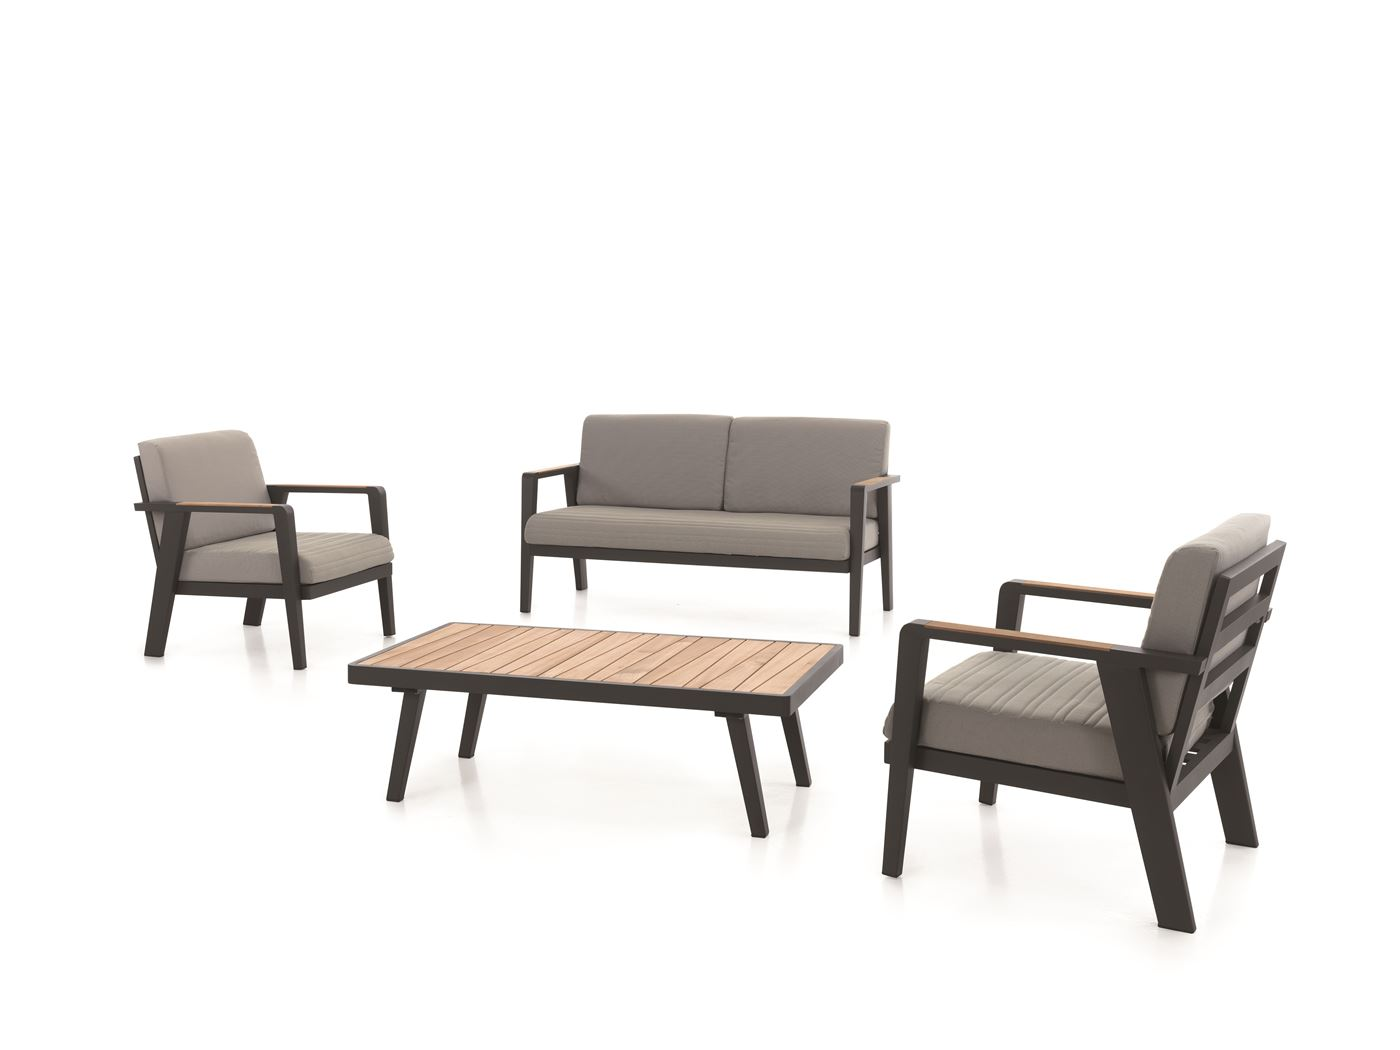 gescova guadeloupe lounge set alu charcoal + teak +cushion